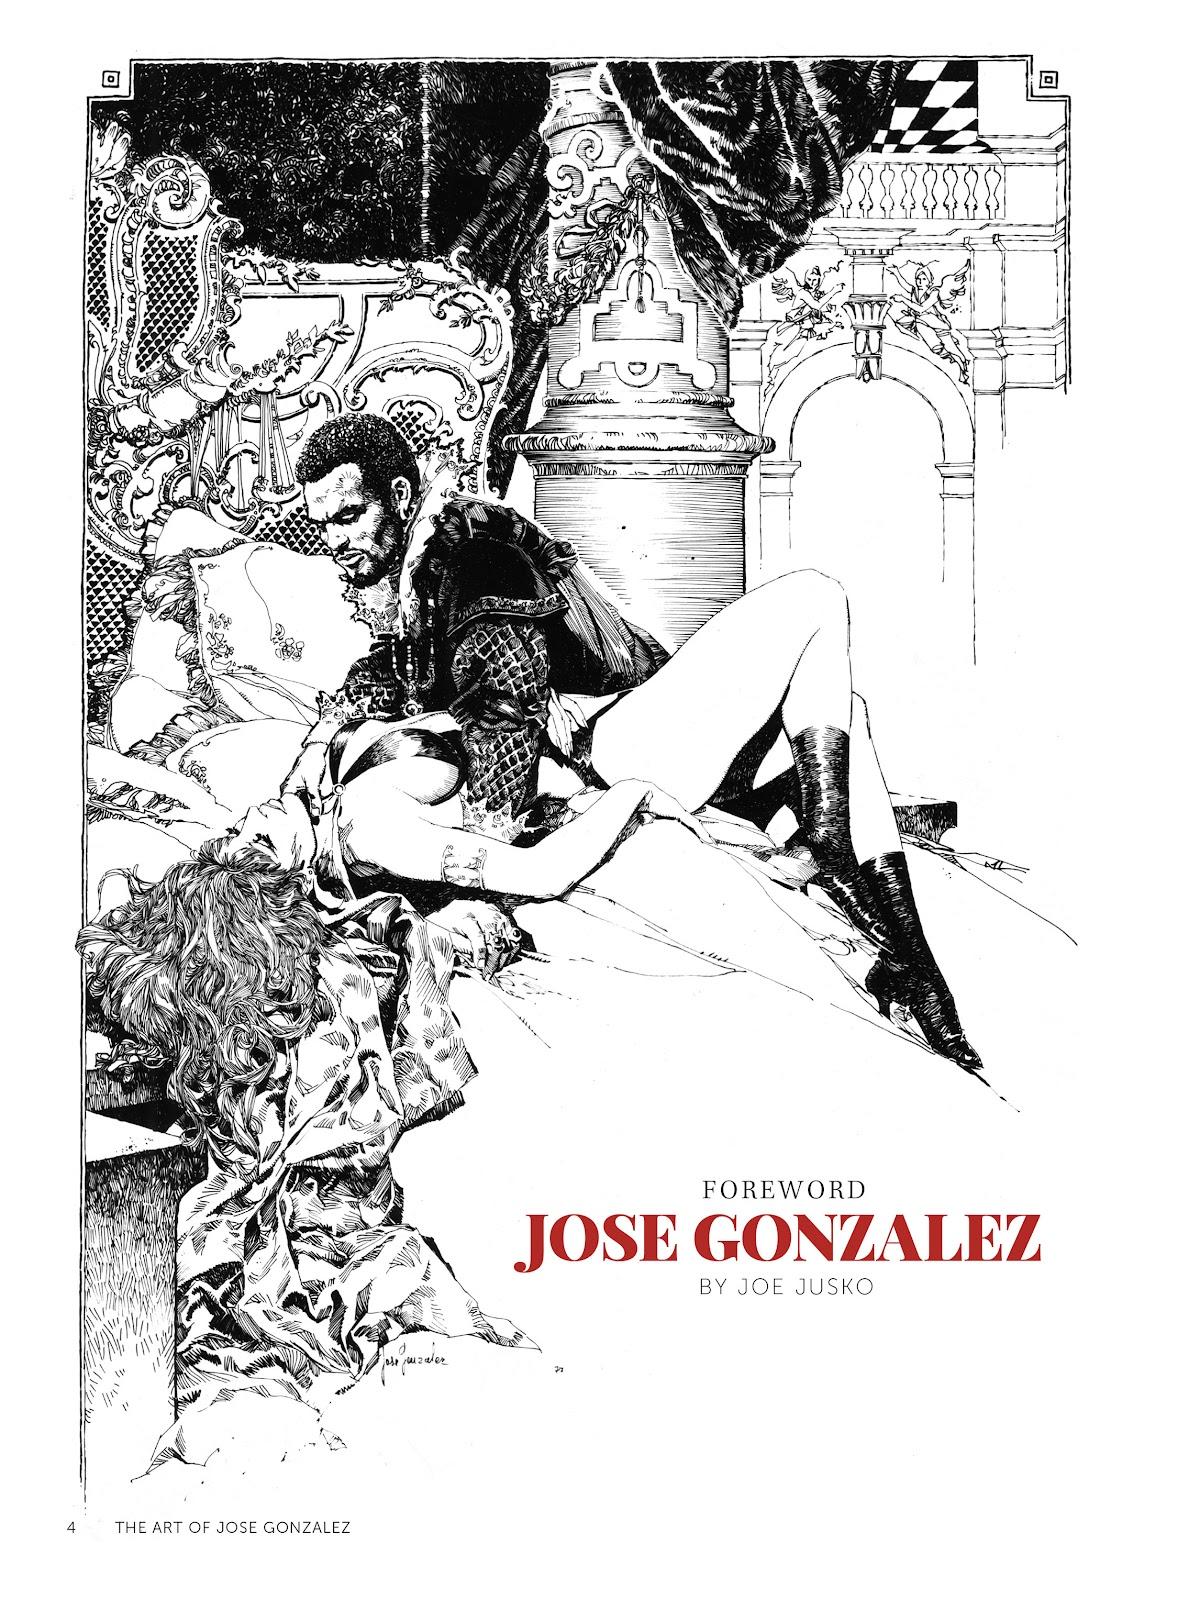 Read online The Art of Jose Gonzalez comic -  Issue # TPB (Part 1) - 5